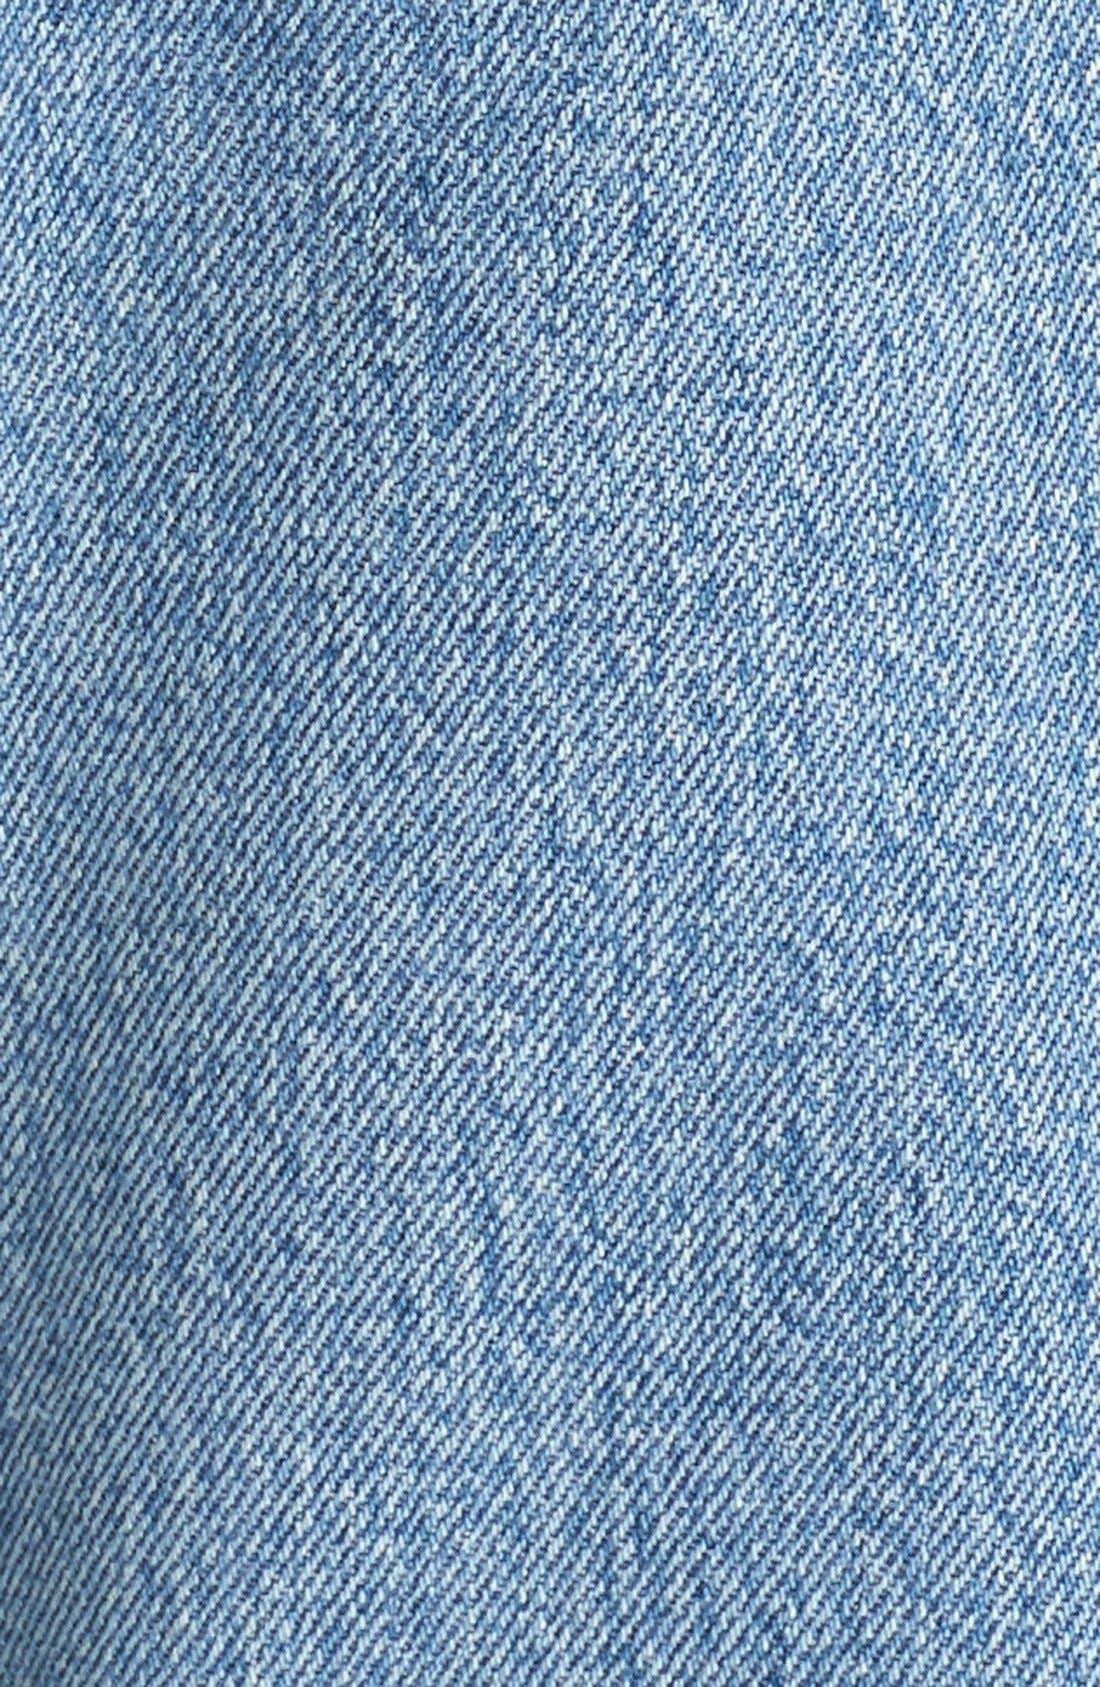 Reconstructed High Waist Ankle Crop Jeans,                             Alternate thumbnail 6, color,                             NO DESTRUCTION